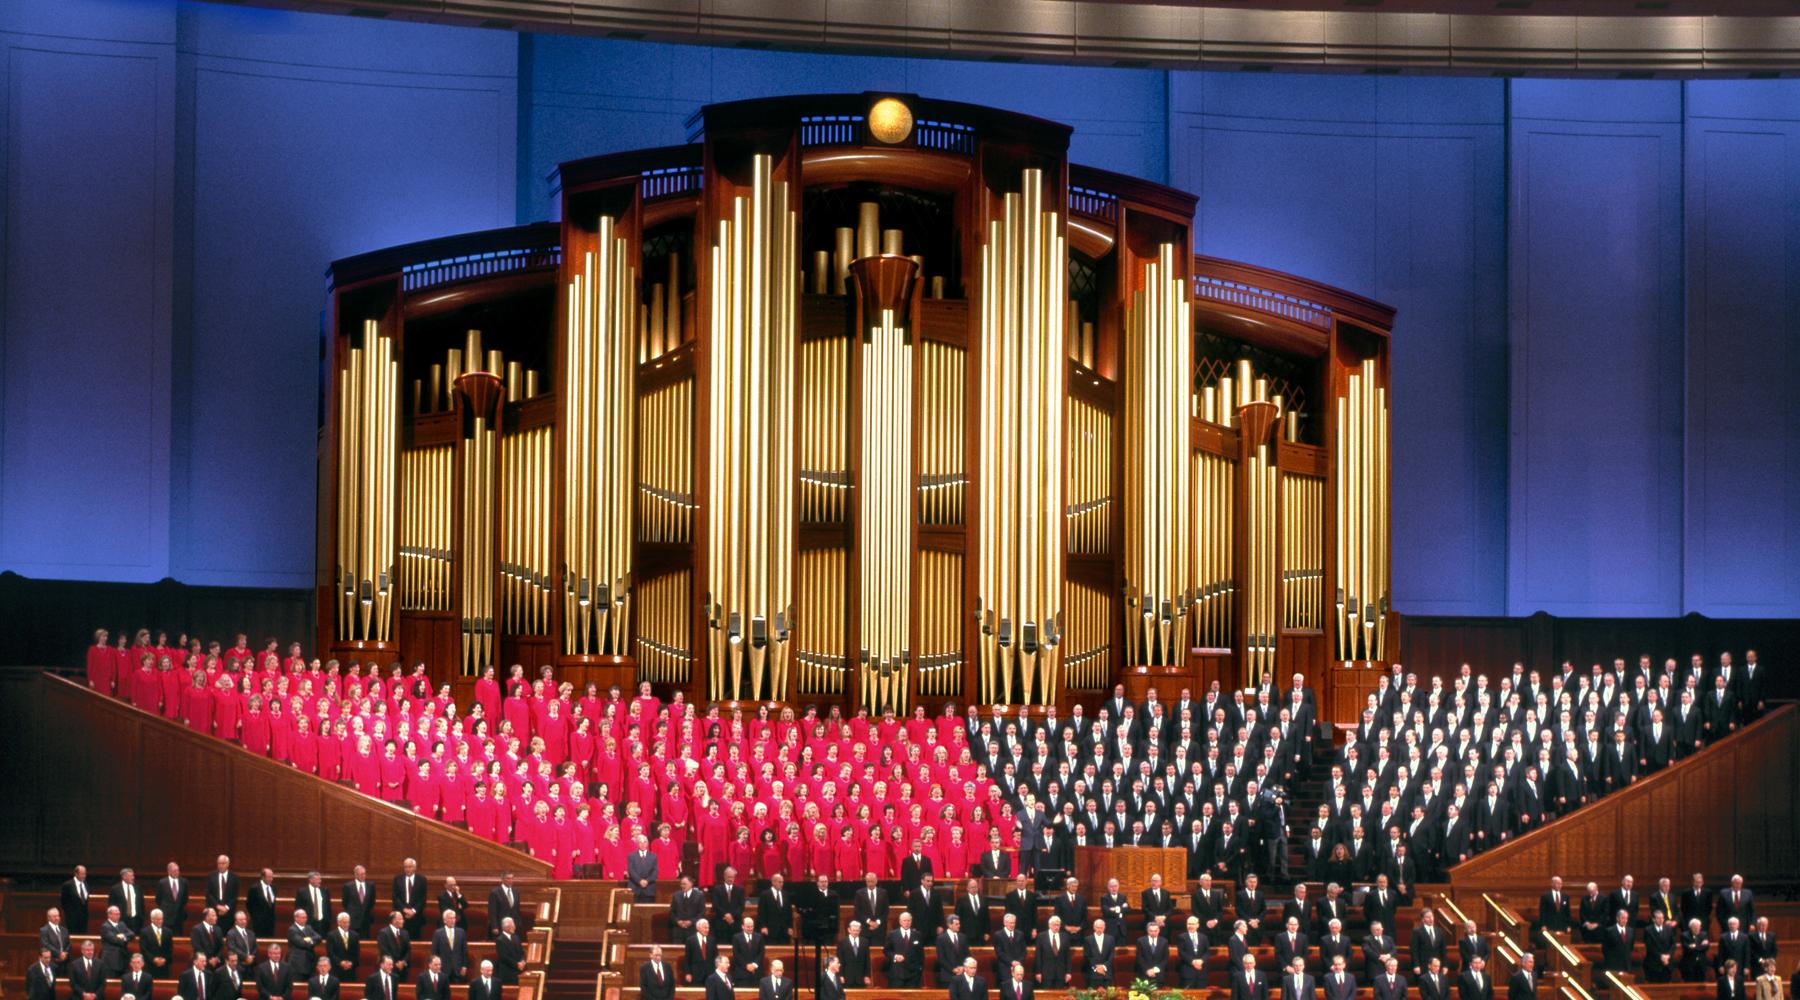 The Church of Jesus Christ of Latter-day Saints, Conference Center, Salt Lake City, UT